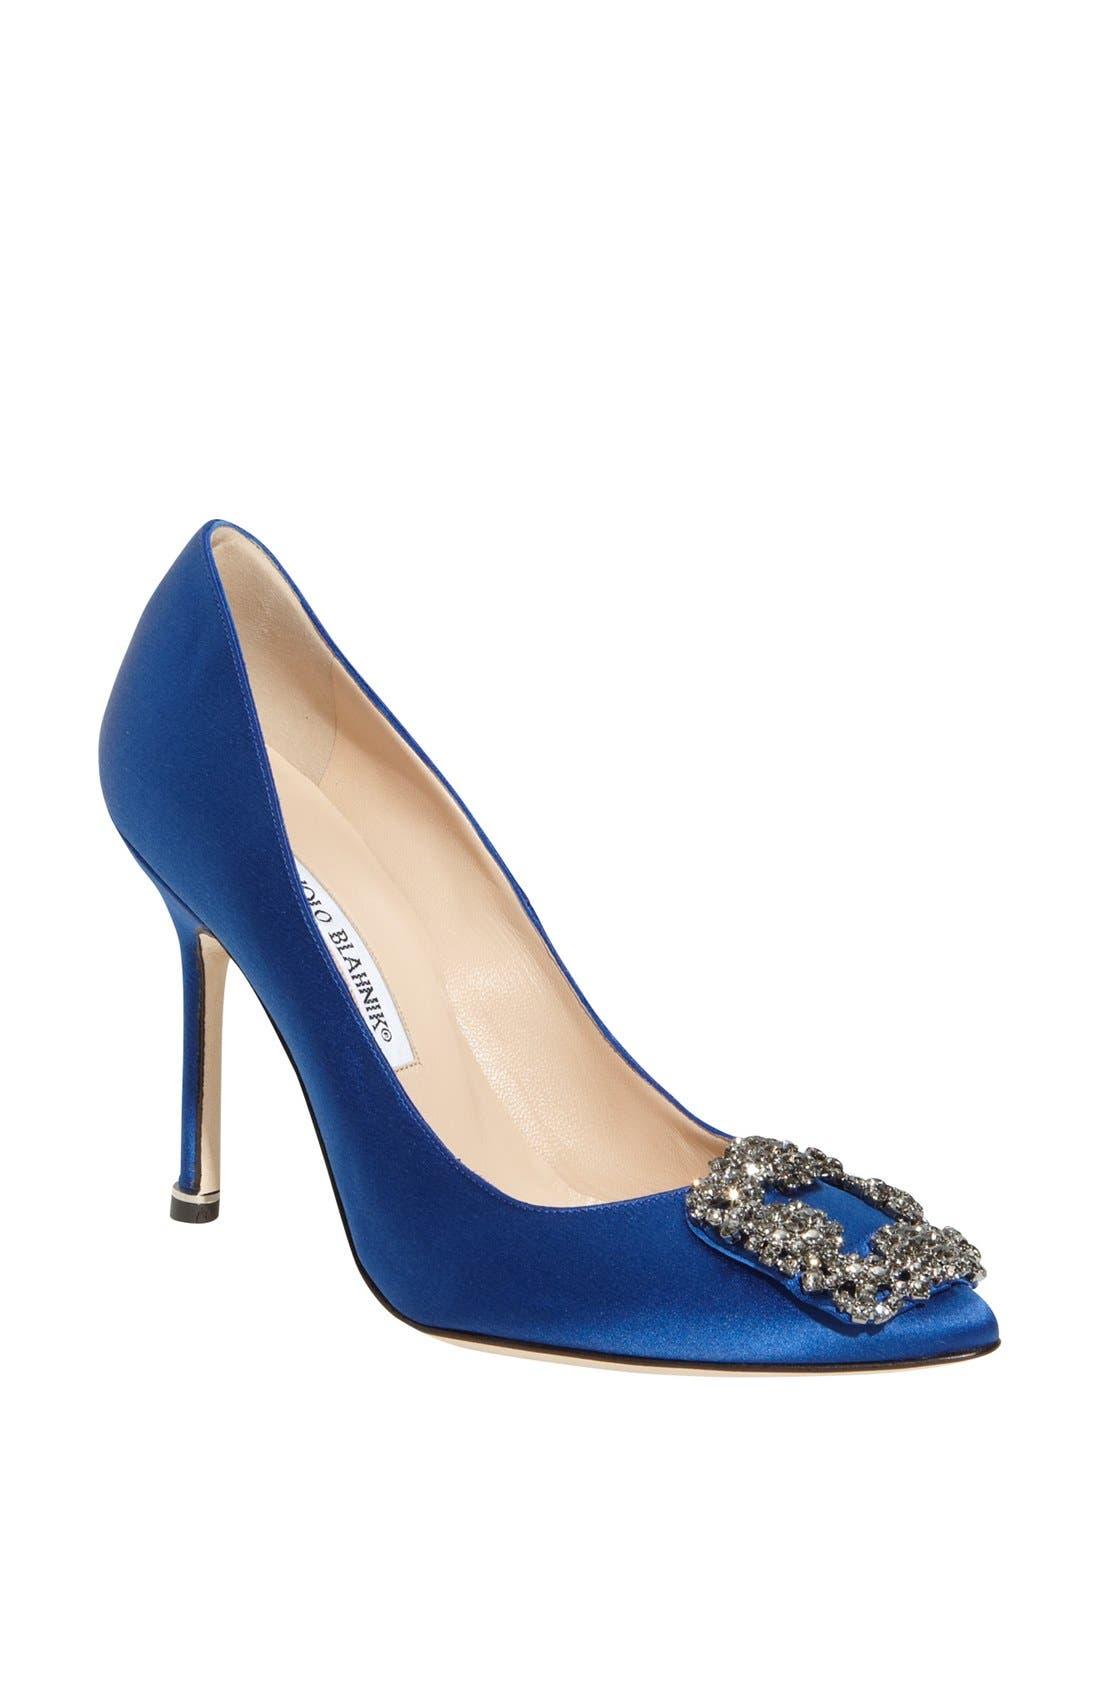 MANOLO BLAHNIK, 'Hangisi' Jewel Pump, Main thumbnail 1, color, BLUE SATIN